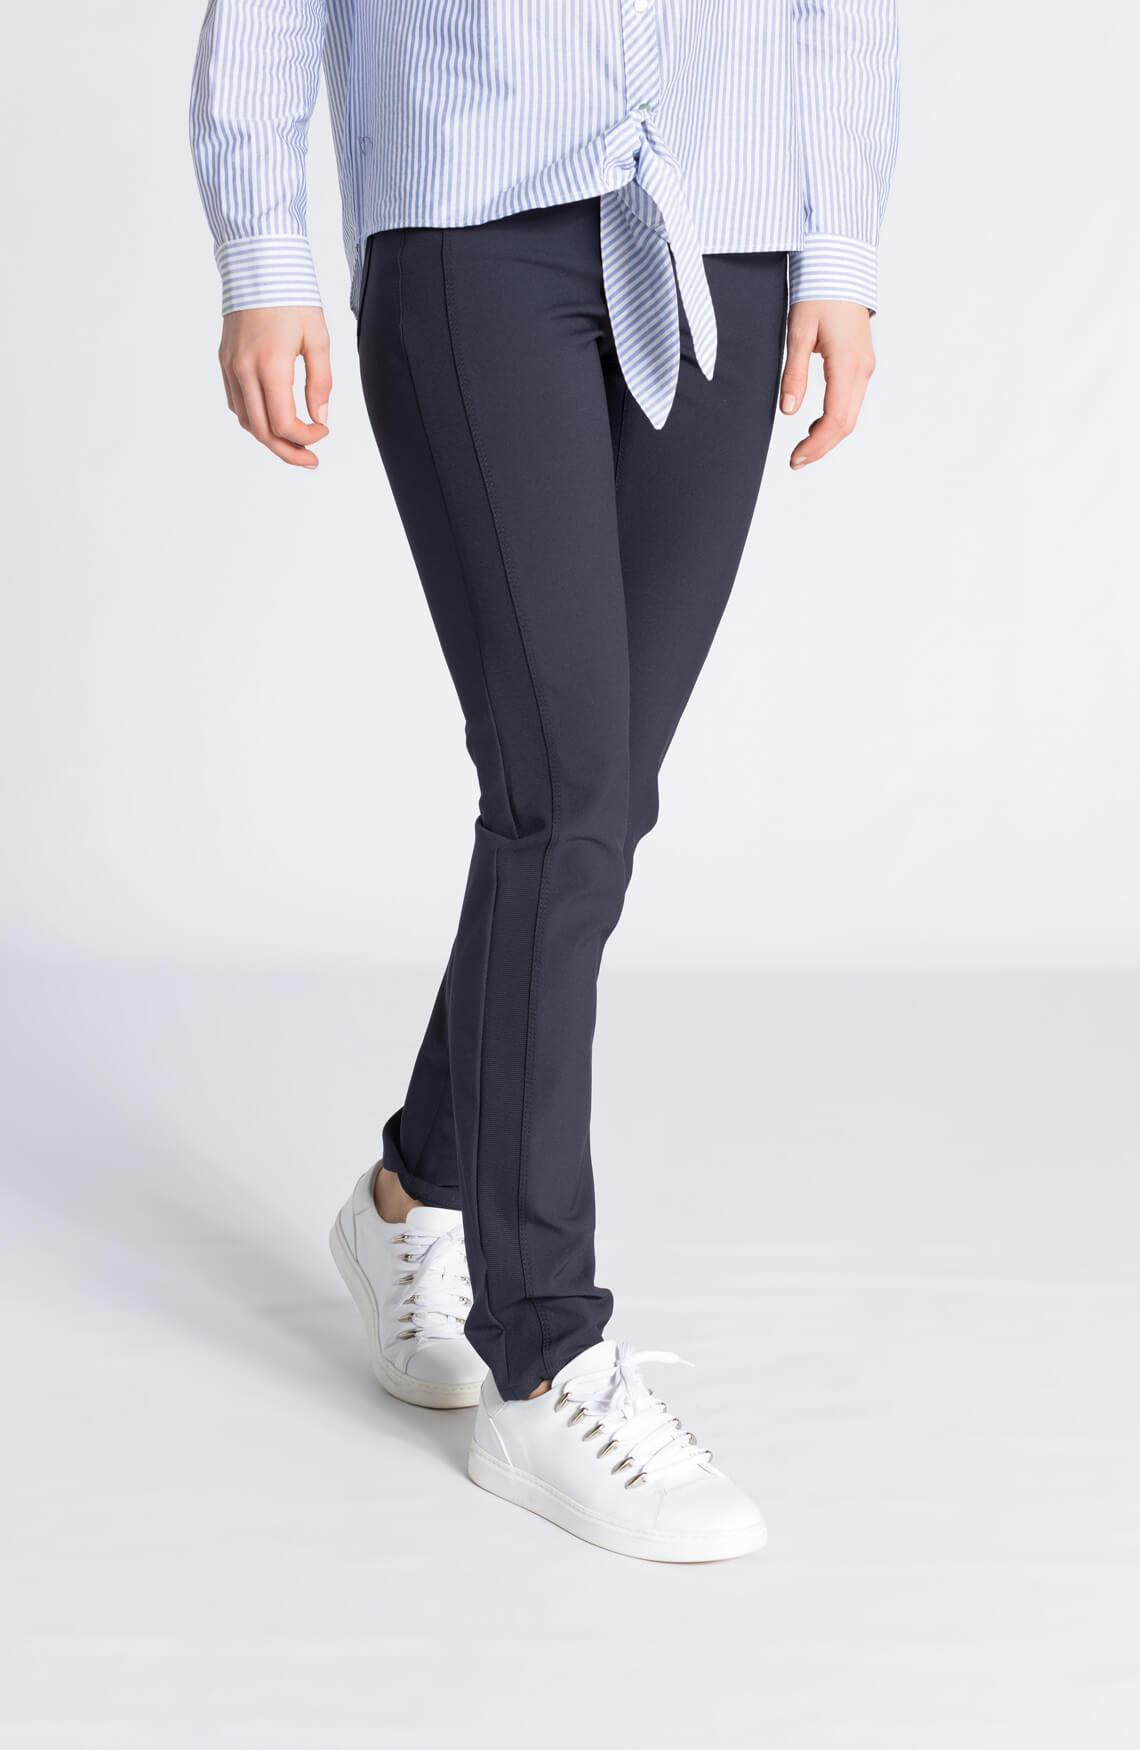 Cambio Dames Parla zip pantalon marine Blauw